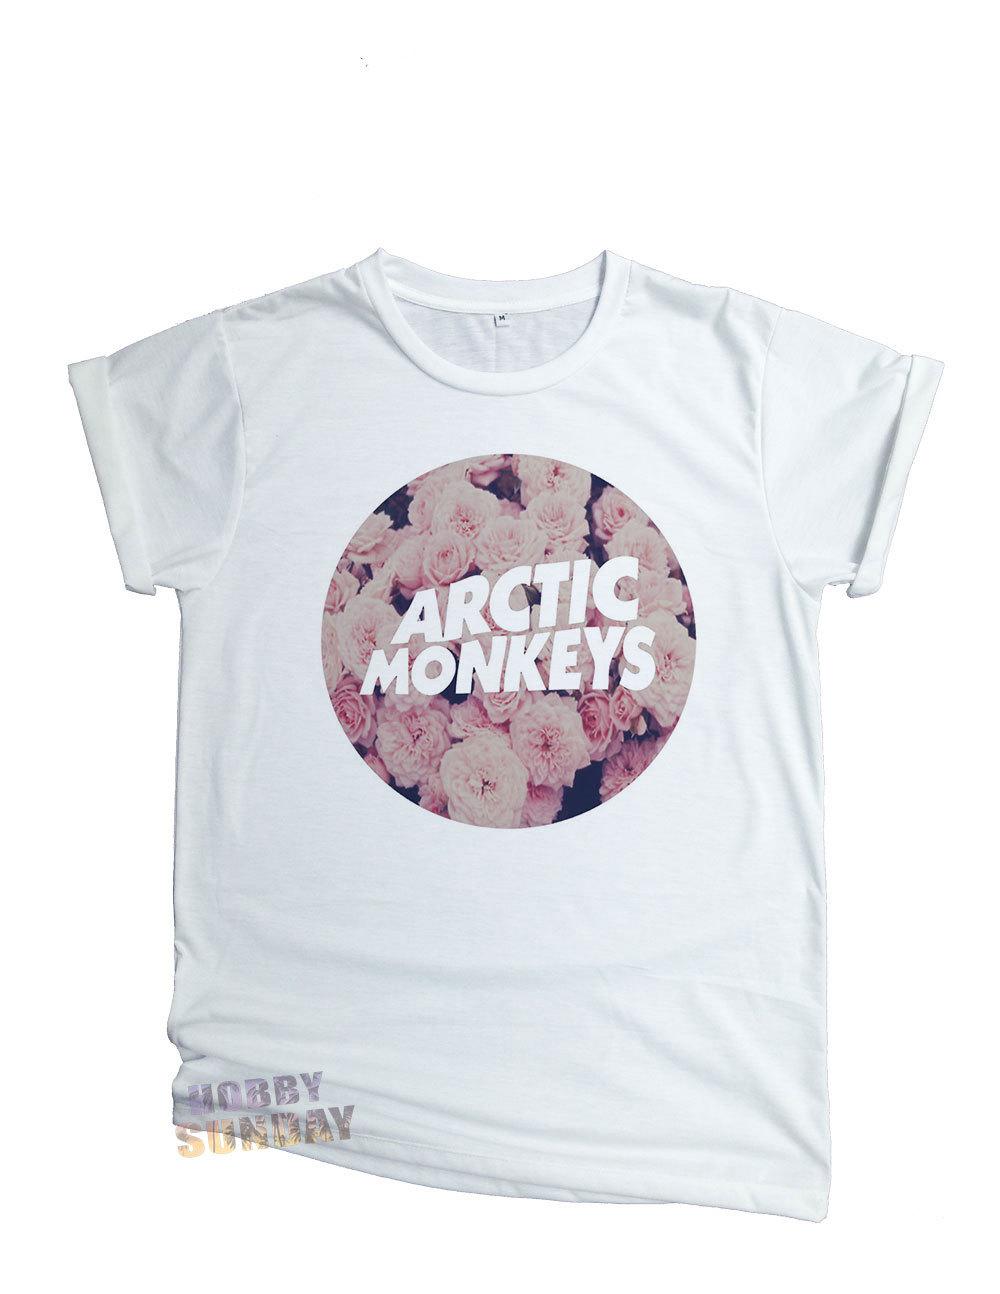 Arctic monkeys floral vintage band indie rock t